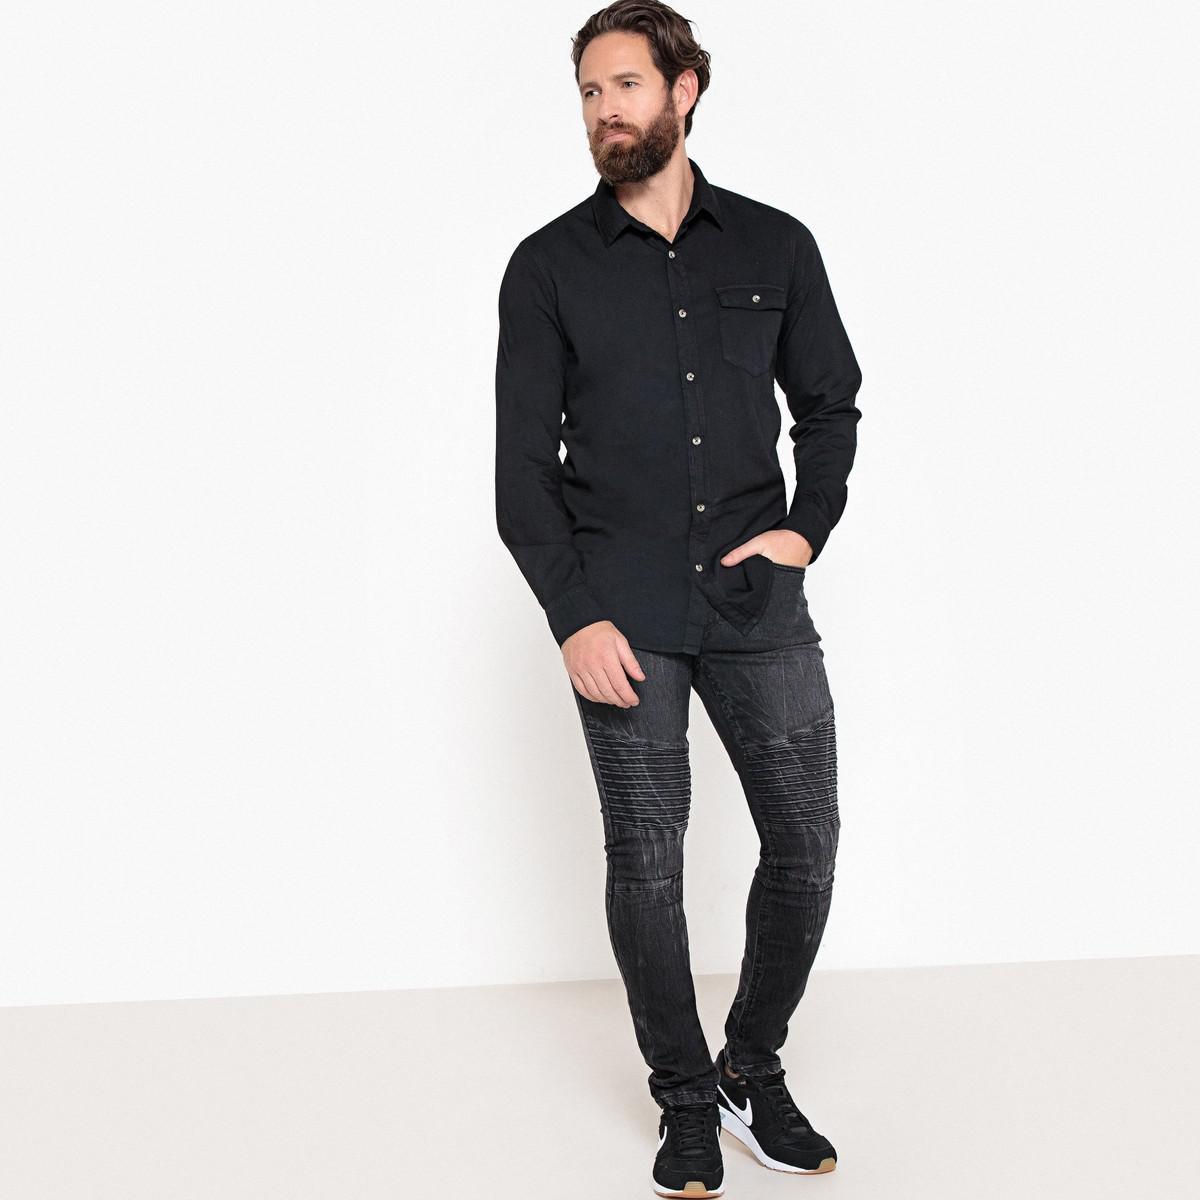 8d957c9c05 LA REDOUTE - Black Long-sleeved Straight Cut Shirt for Men - Lyst. View  fullscreen